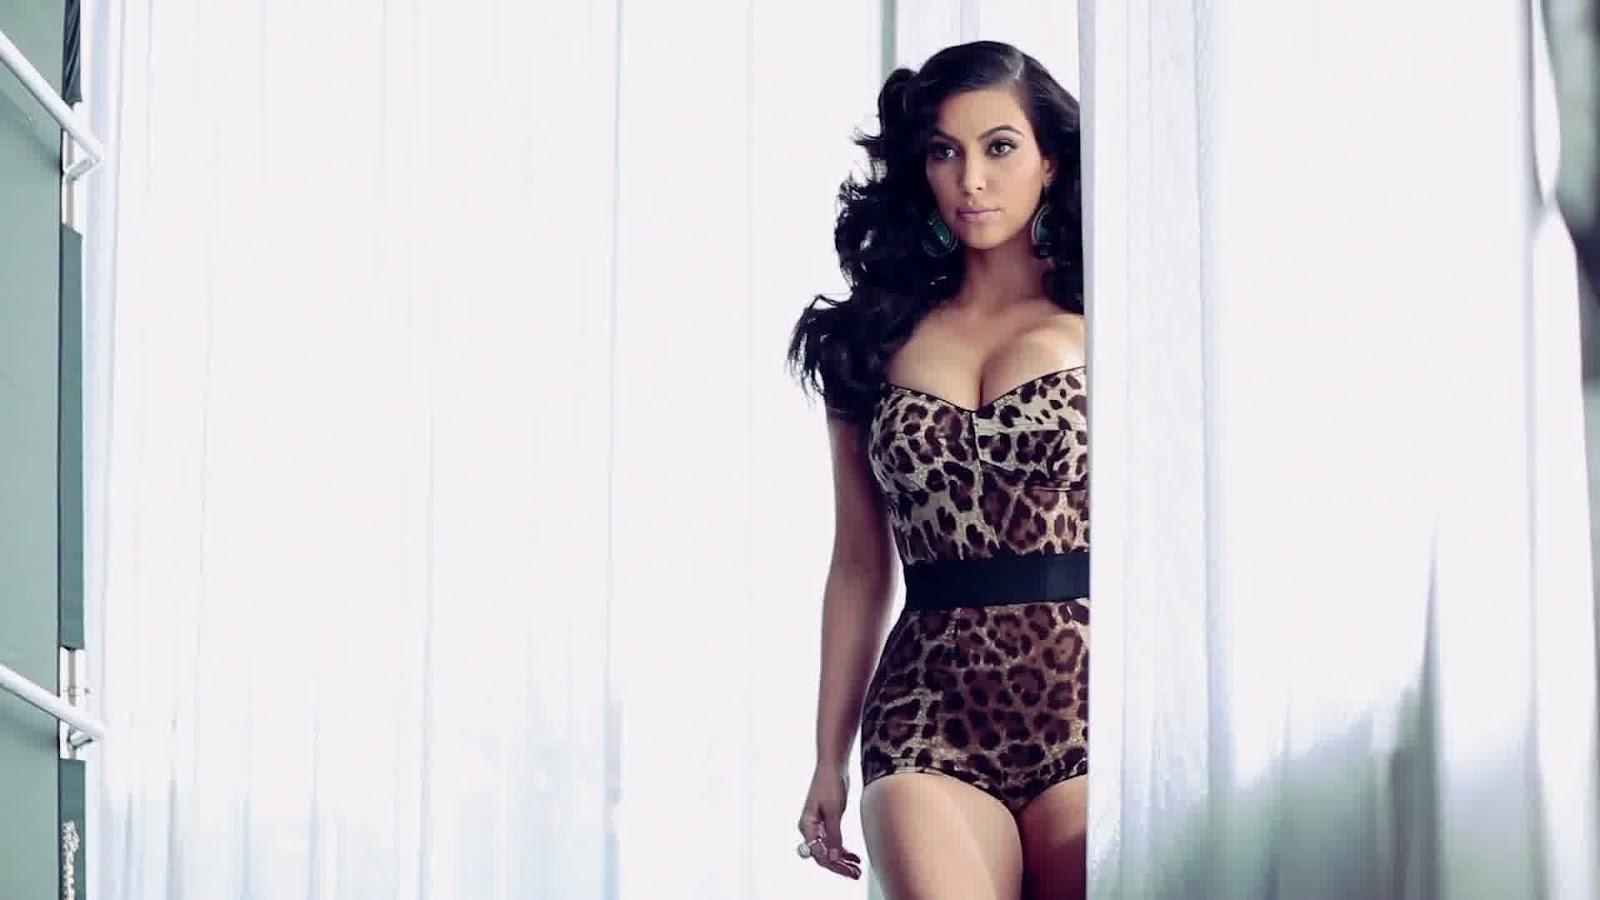 http://2.bp.blogspot.com/-S3Z0HEPkzYc/T9UE2bKFhfI/AAAAAAAAFgw/tjTfva7LoZ4/s1600/Kim-Kardashian-10.jpg